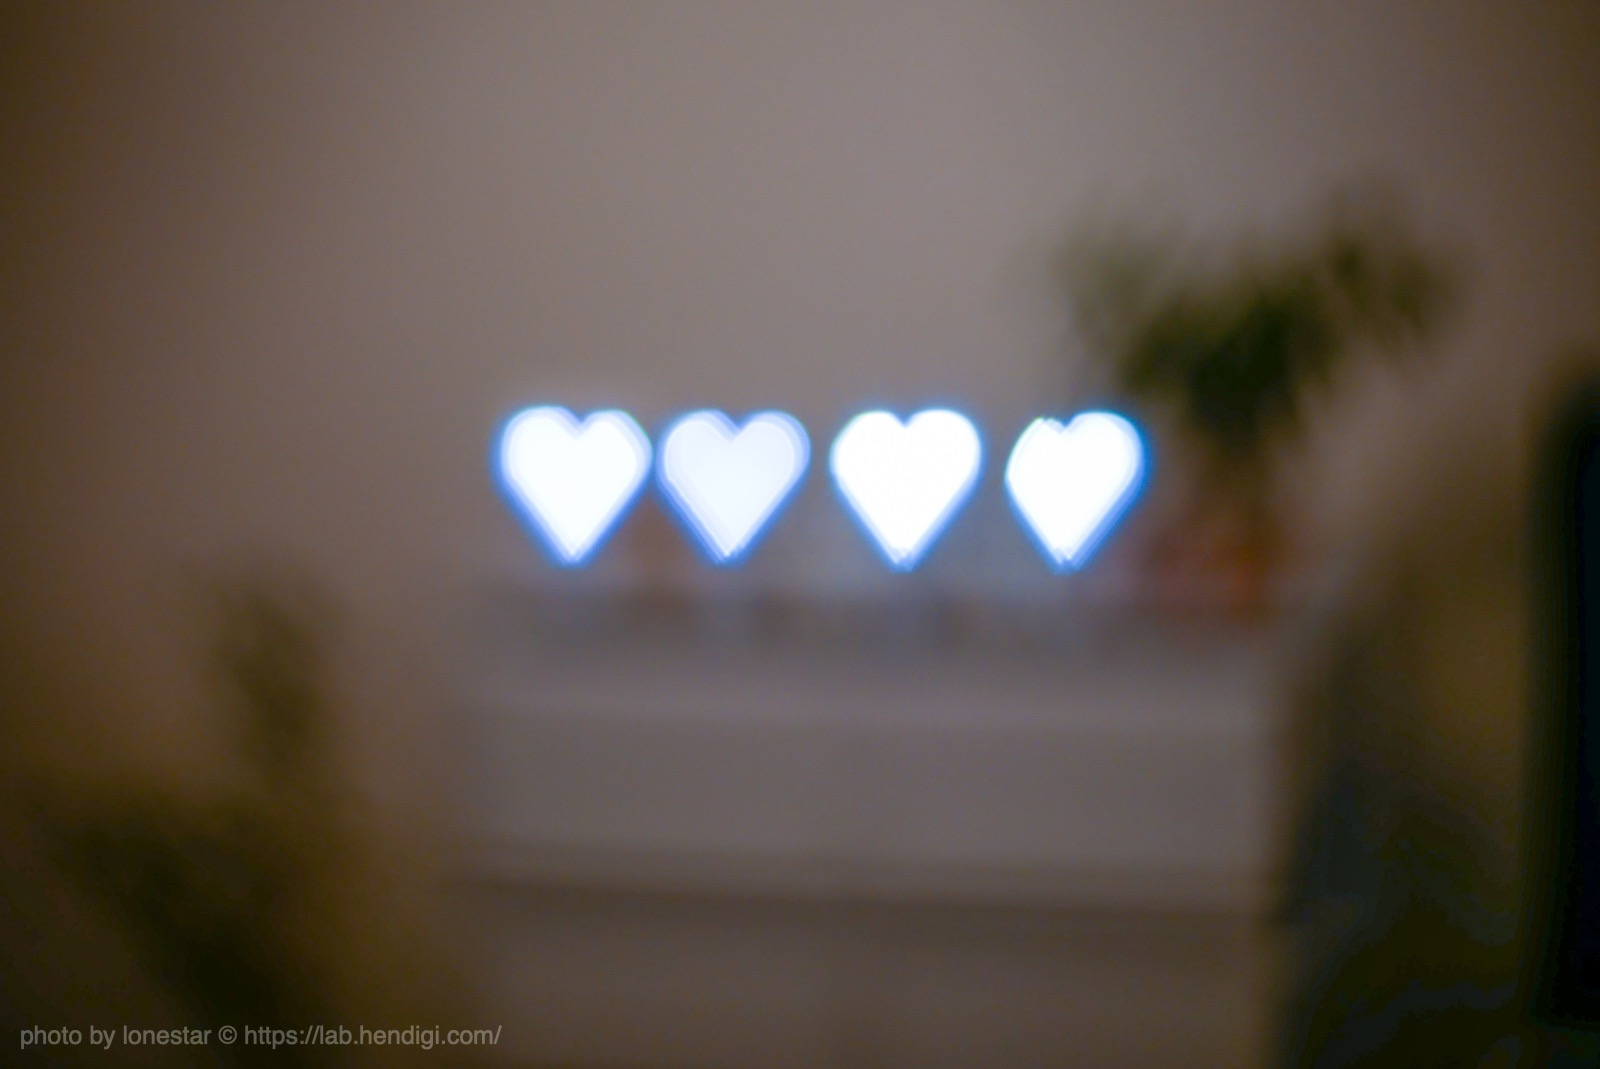 GIZMON Bokeh Lens Illuminator マイクロフォーサーズ 作例写真